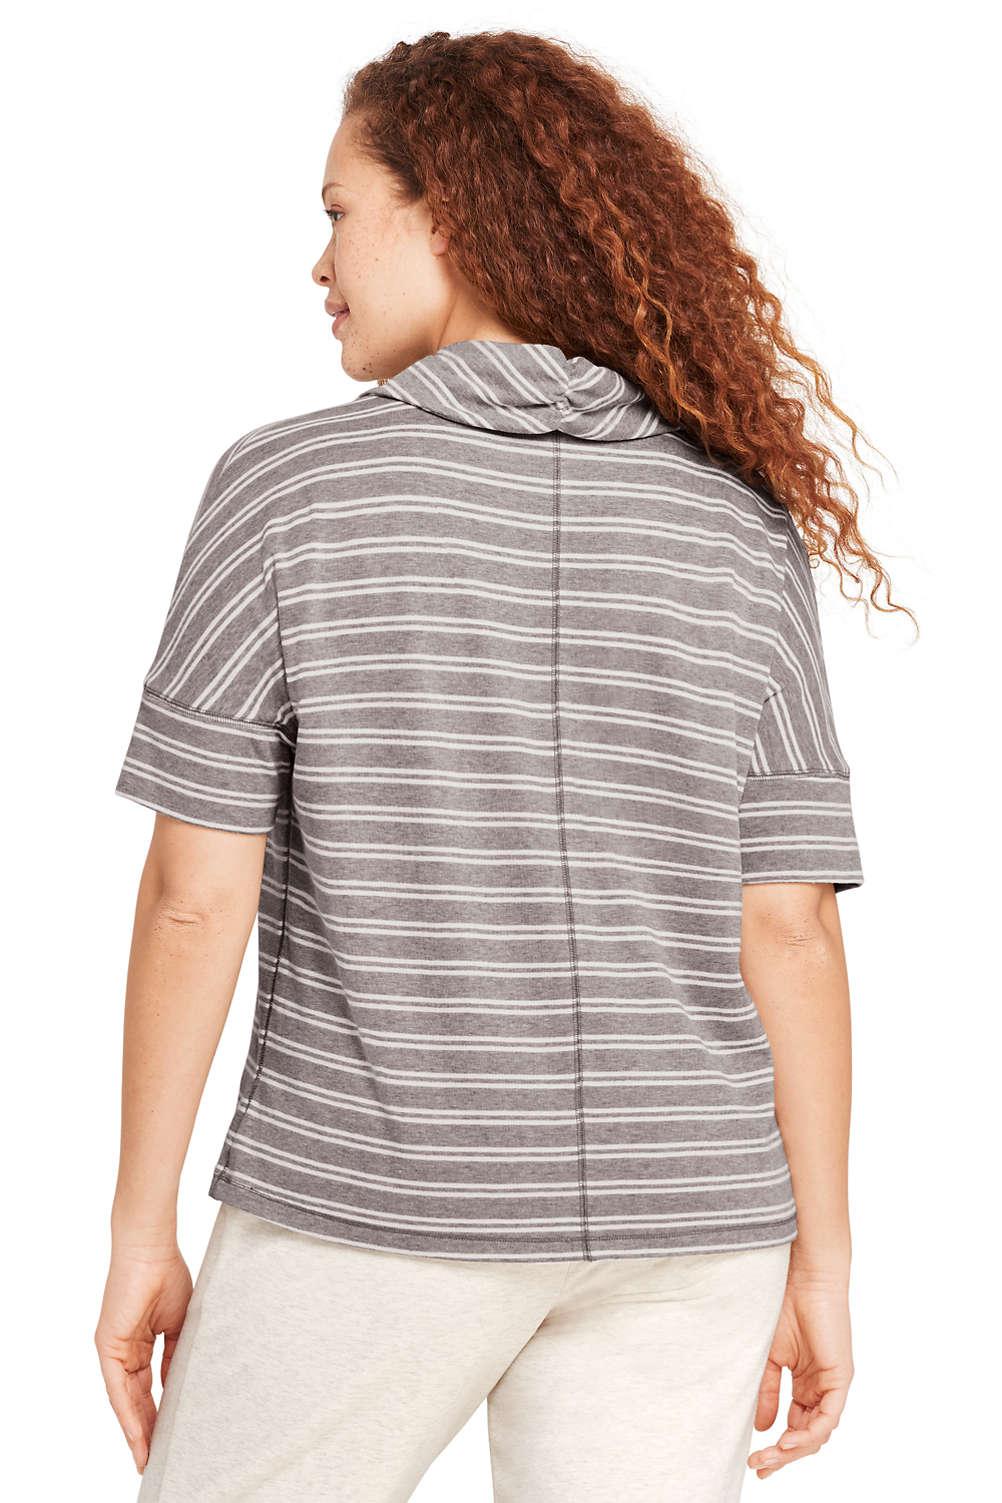 e358e84ad6c Women s Plus Size Stripe Dolman Sleeve Cowl Neck Top from Lands  End